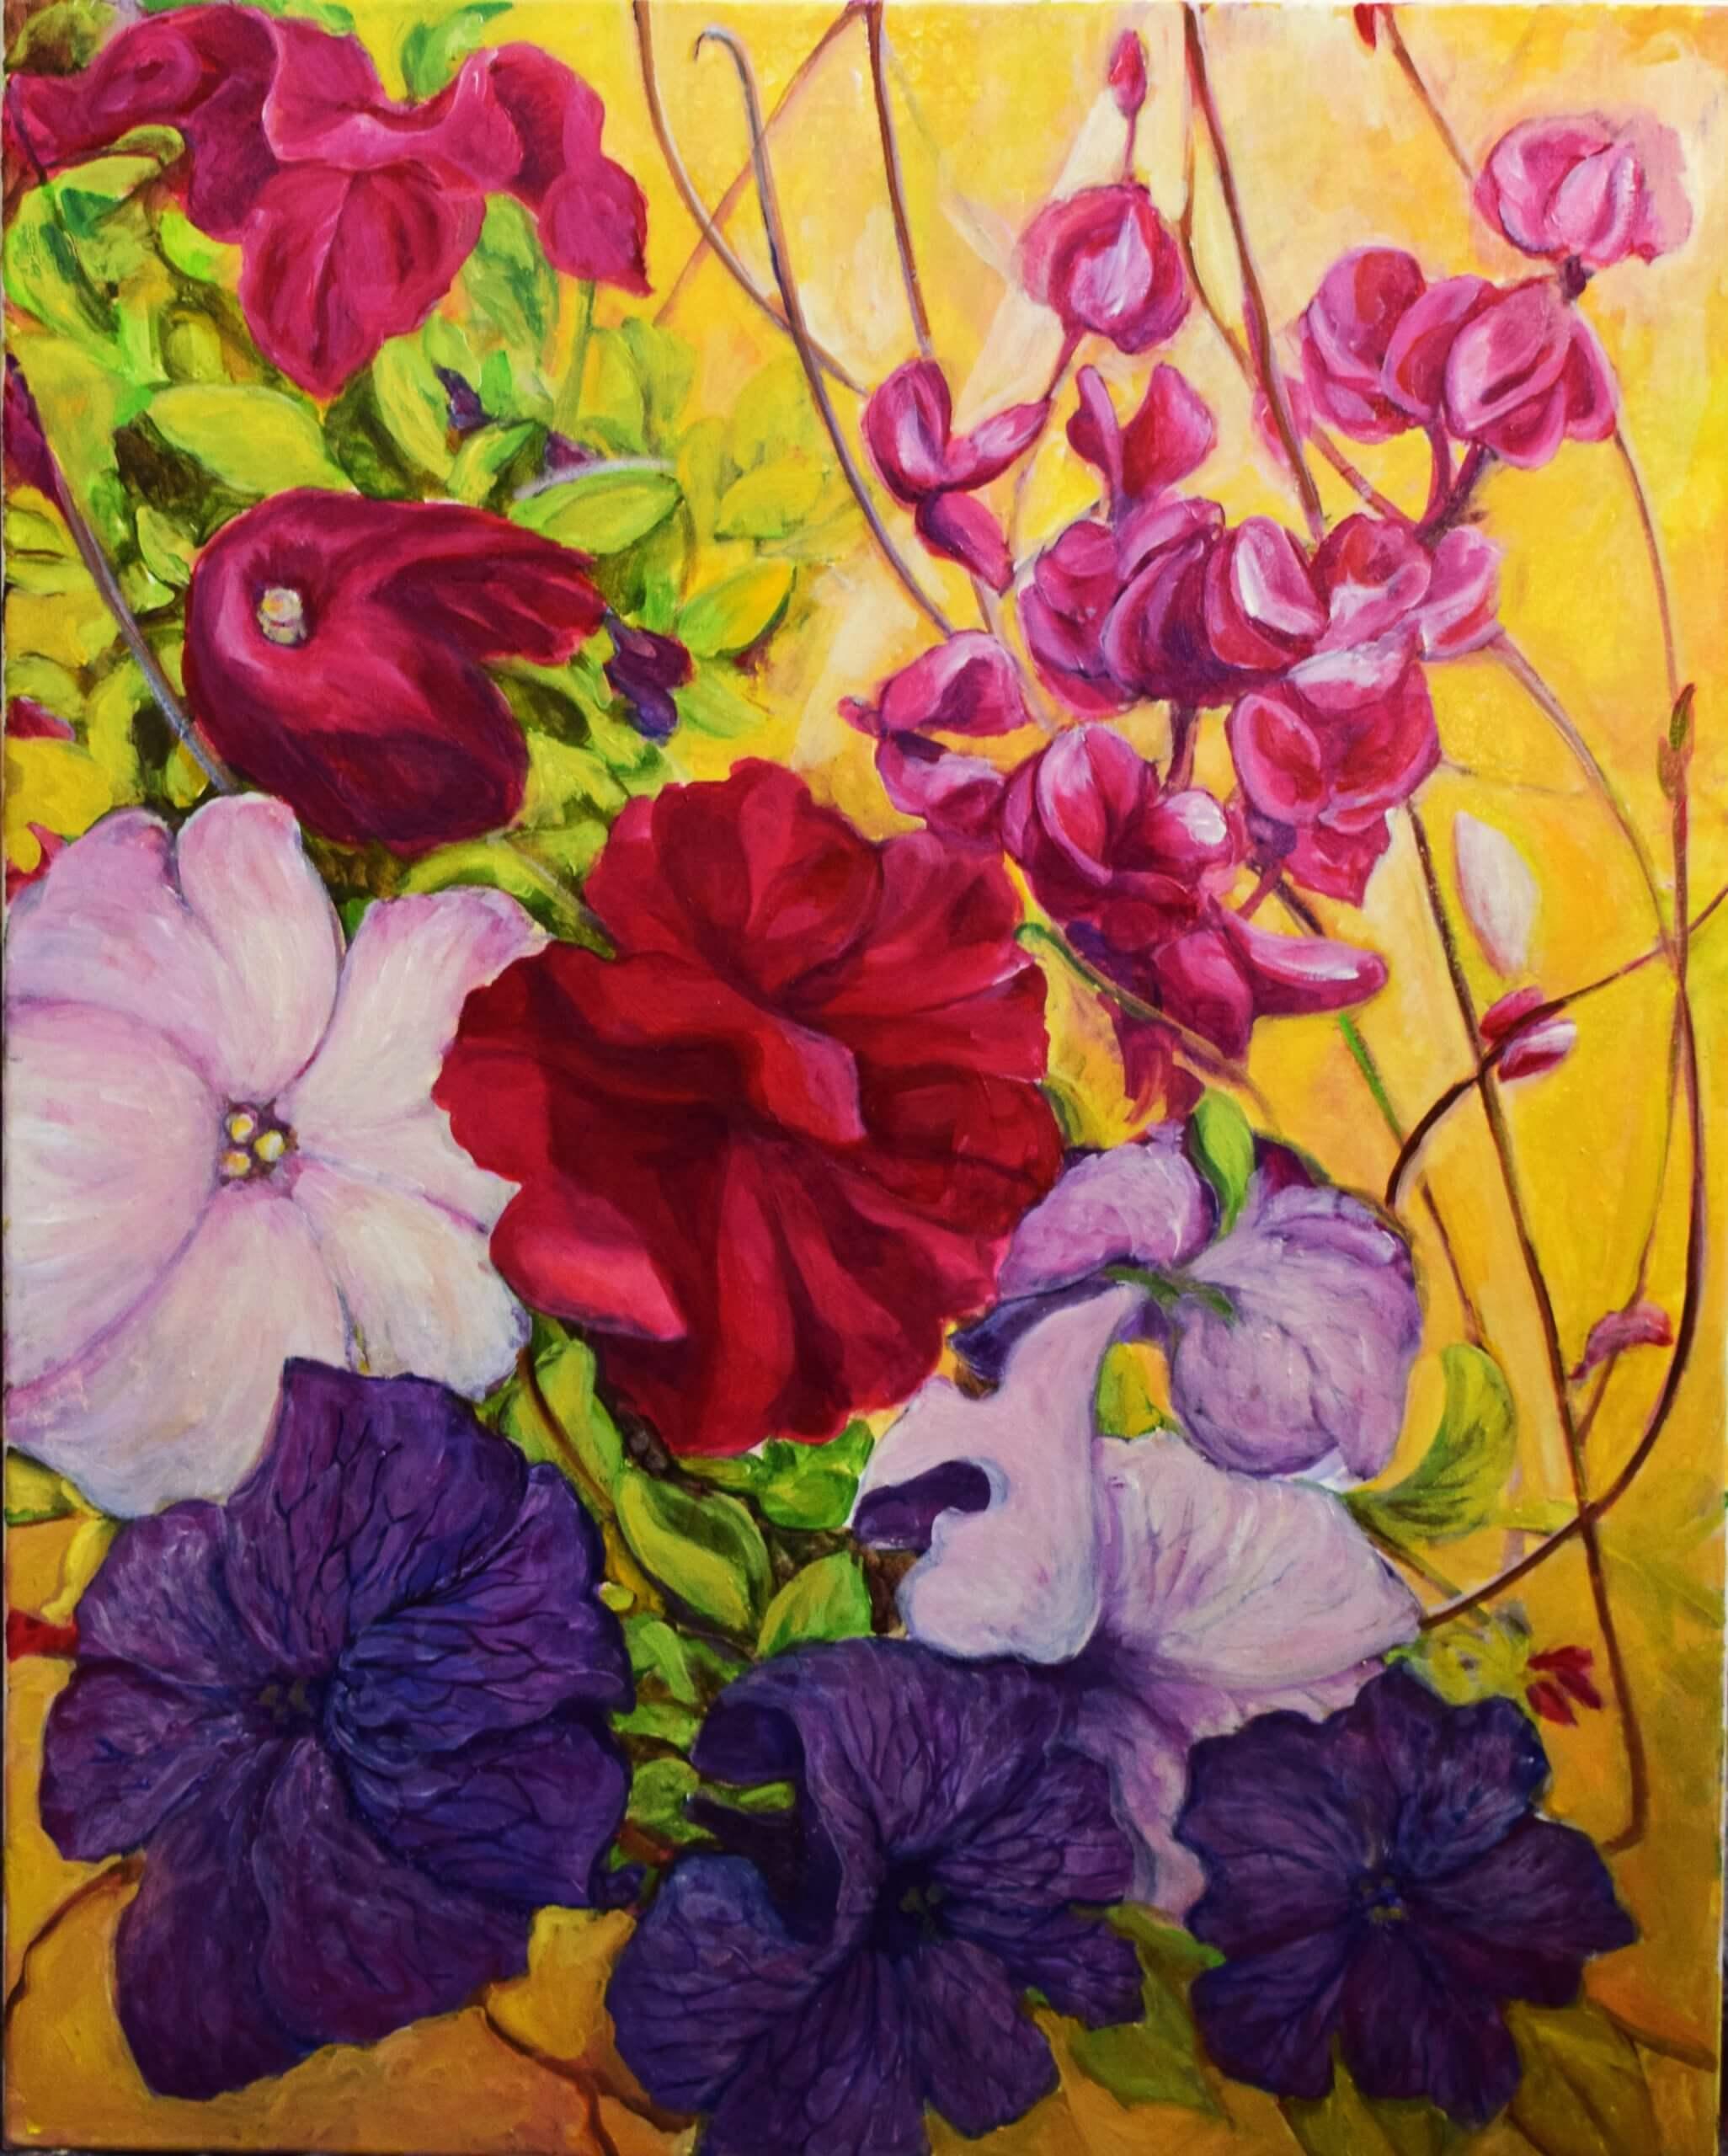 Blumen aus Sakmara, 80x60 cm, 2019 Tatjana Meier